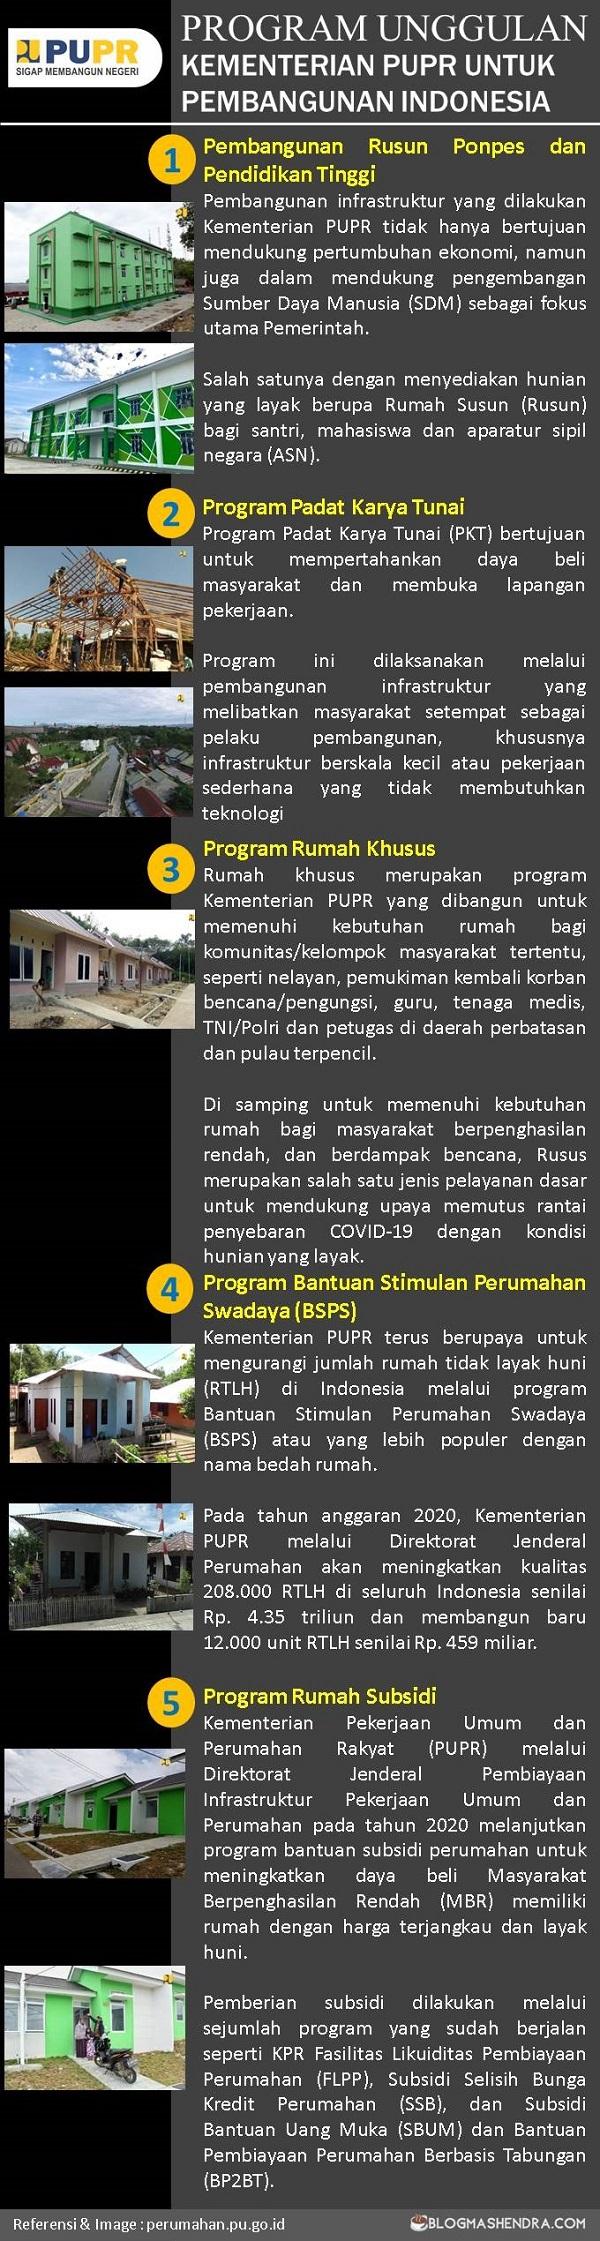 Program Unggulan Kementerian PUPR